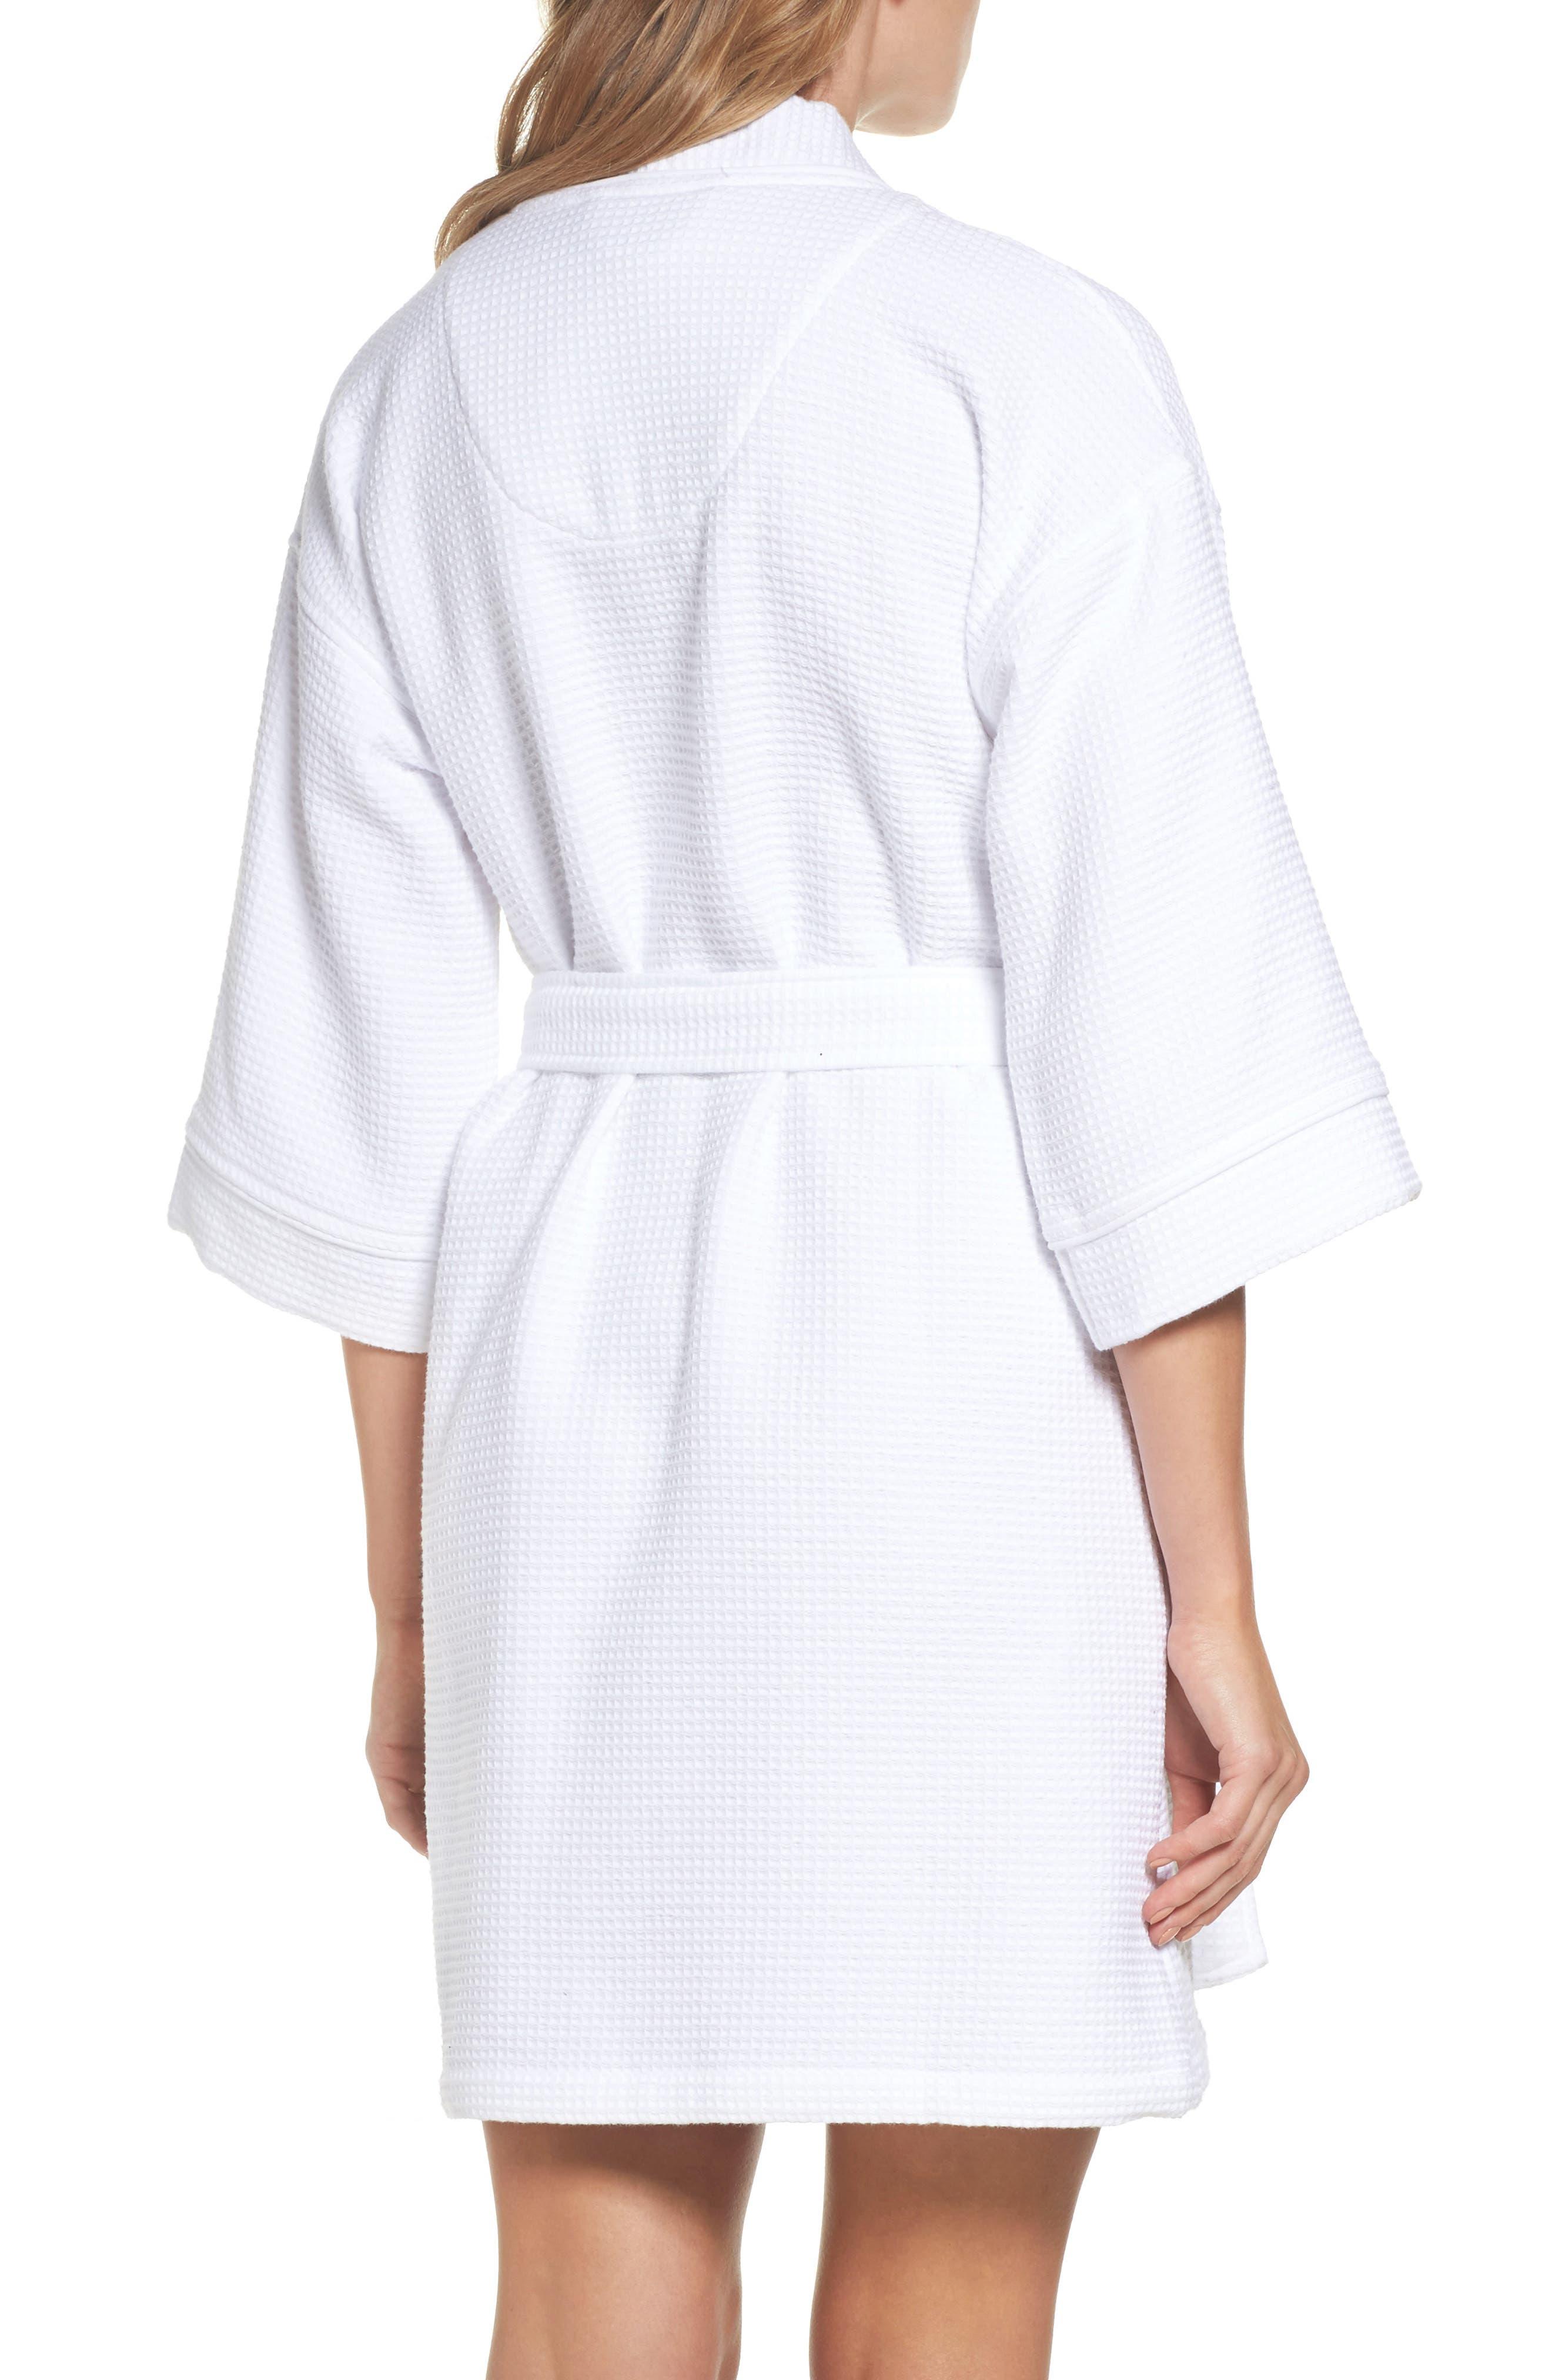 Alternate Image 2  - Nordstrom Lingerie Waffle Knit Short Robe